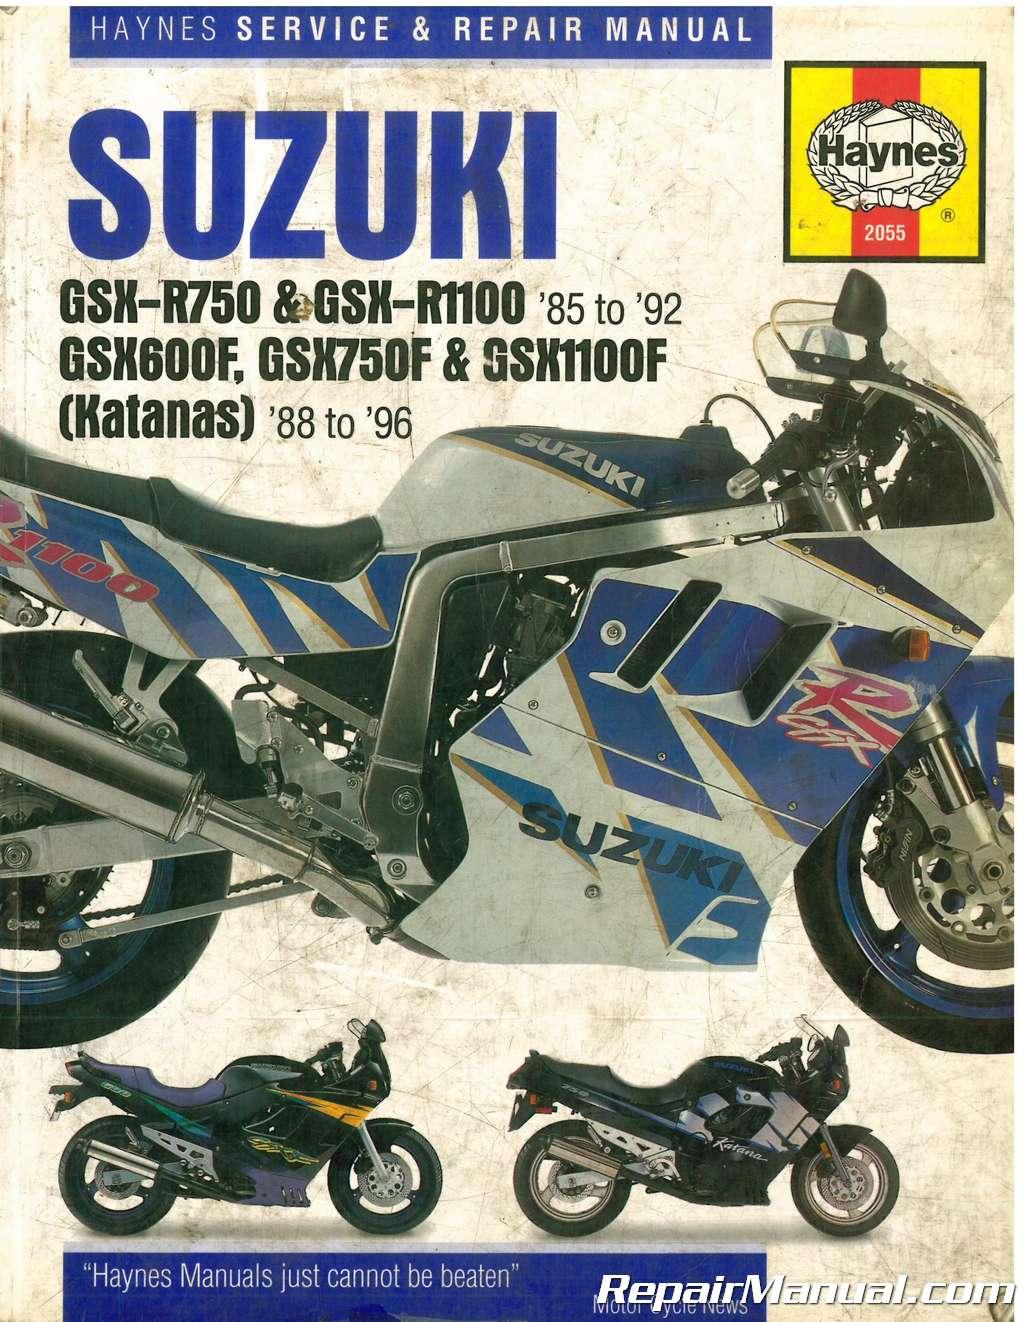 used suzuki gsx r 750 gsx r 1100 1985 1992 katana 600 750 1100 1988 rh repairmanual com 1999 suzuki katana 600 owners manual 1999 suzuki katana 600 owners manual